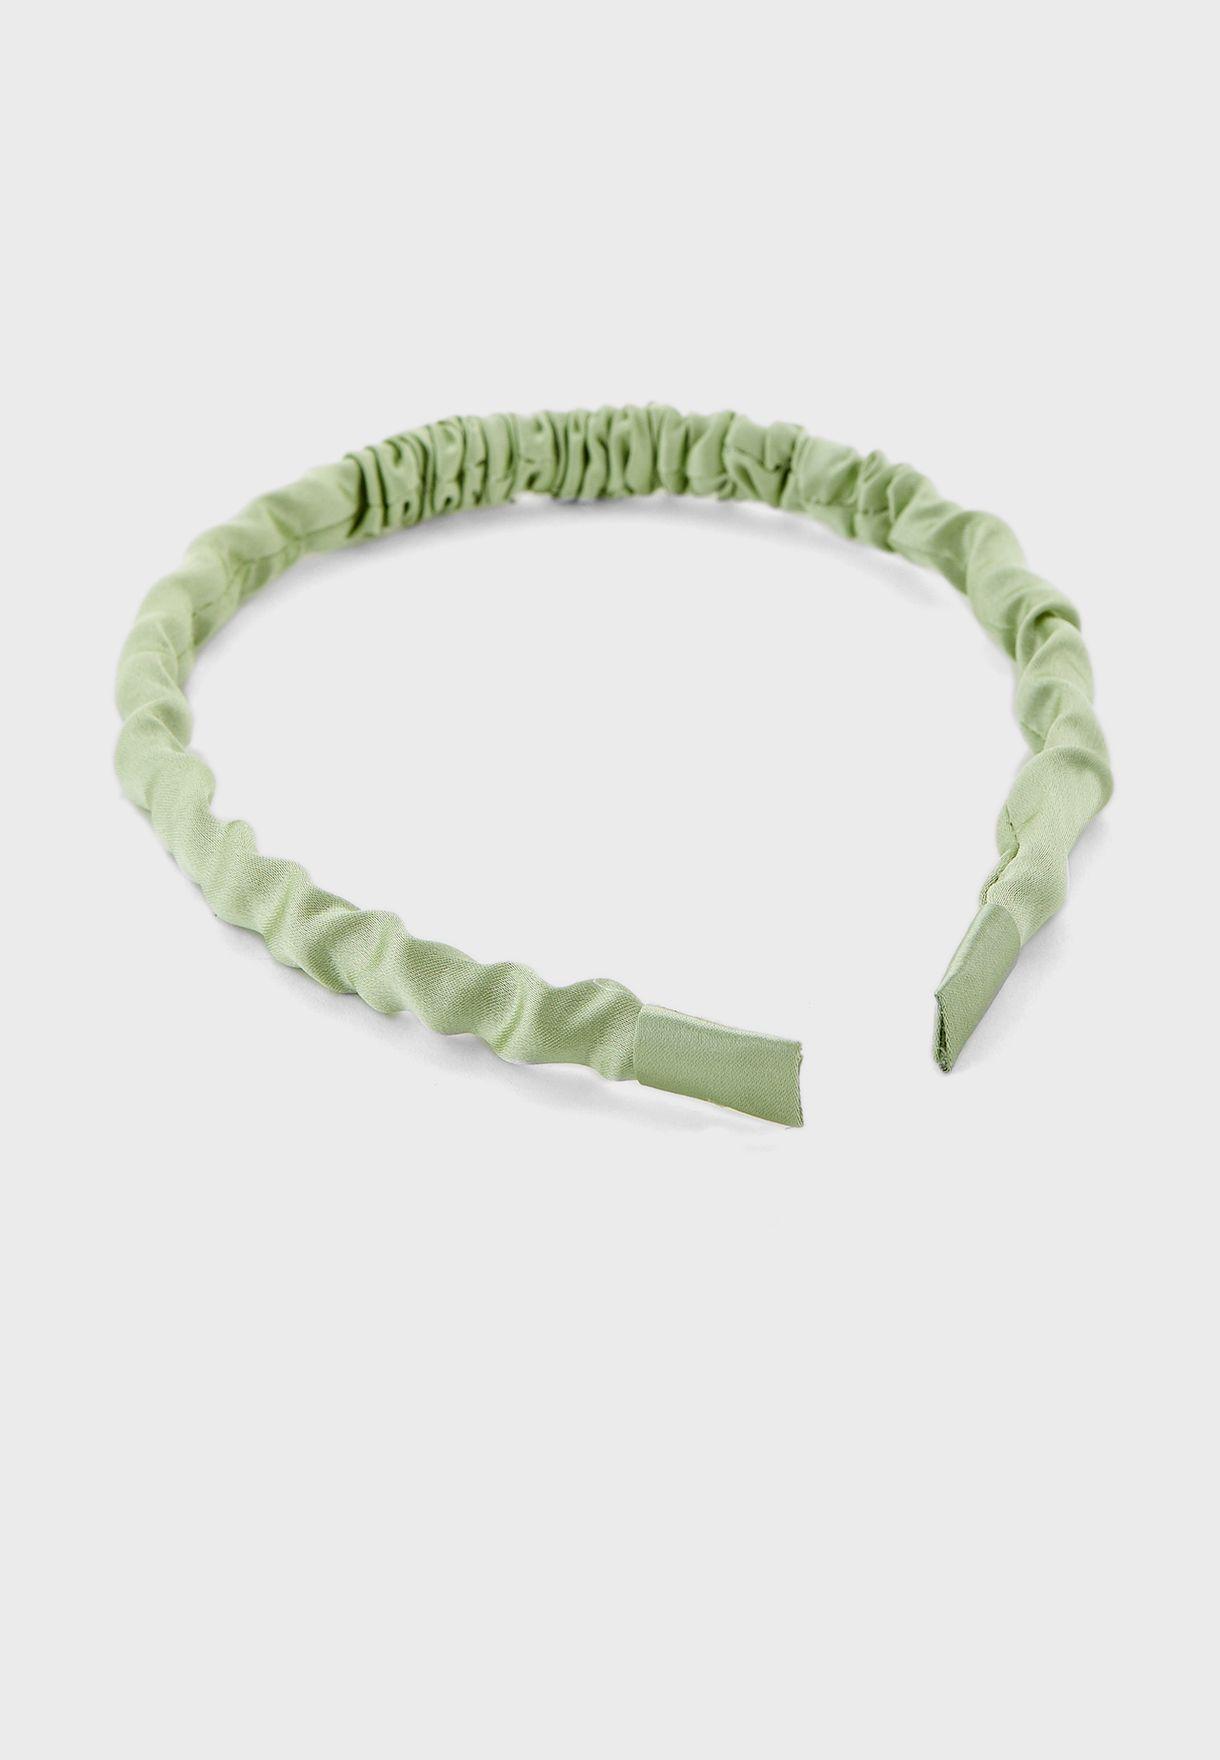 Ruched Skinny Headband